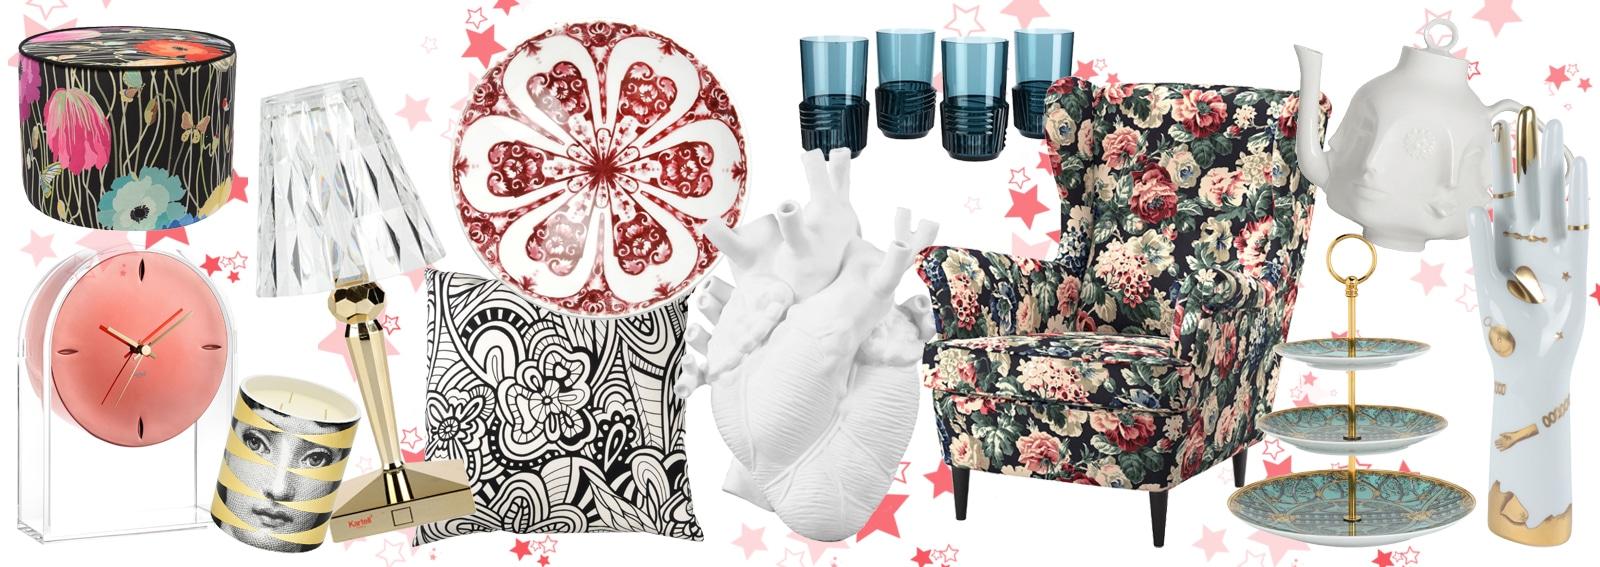 cover-regali-natale-mamma-design-2018-desktop